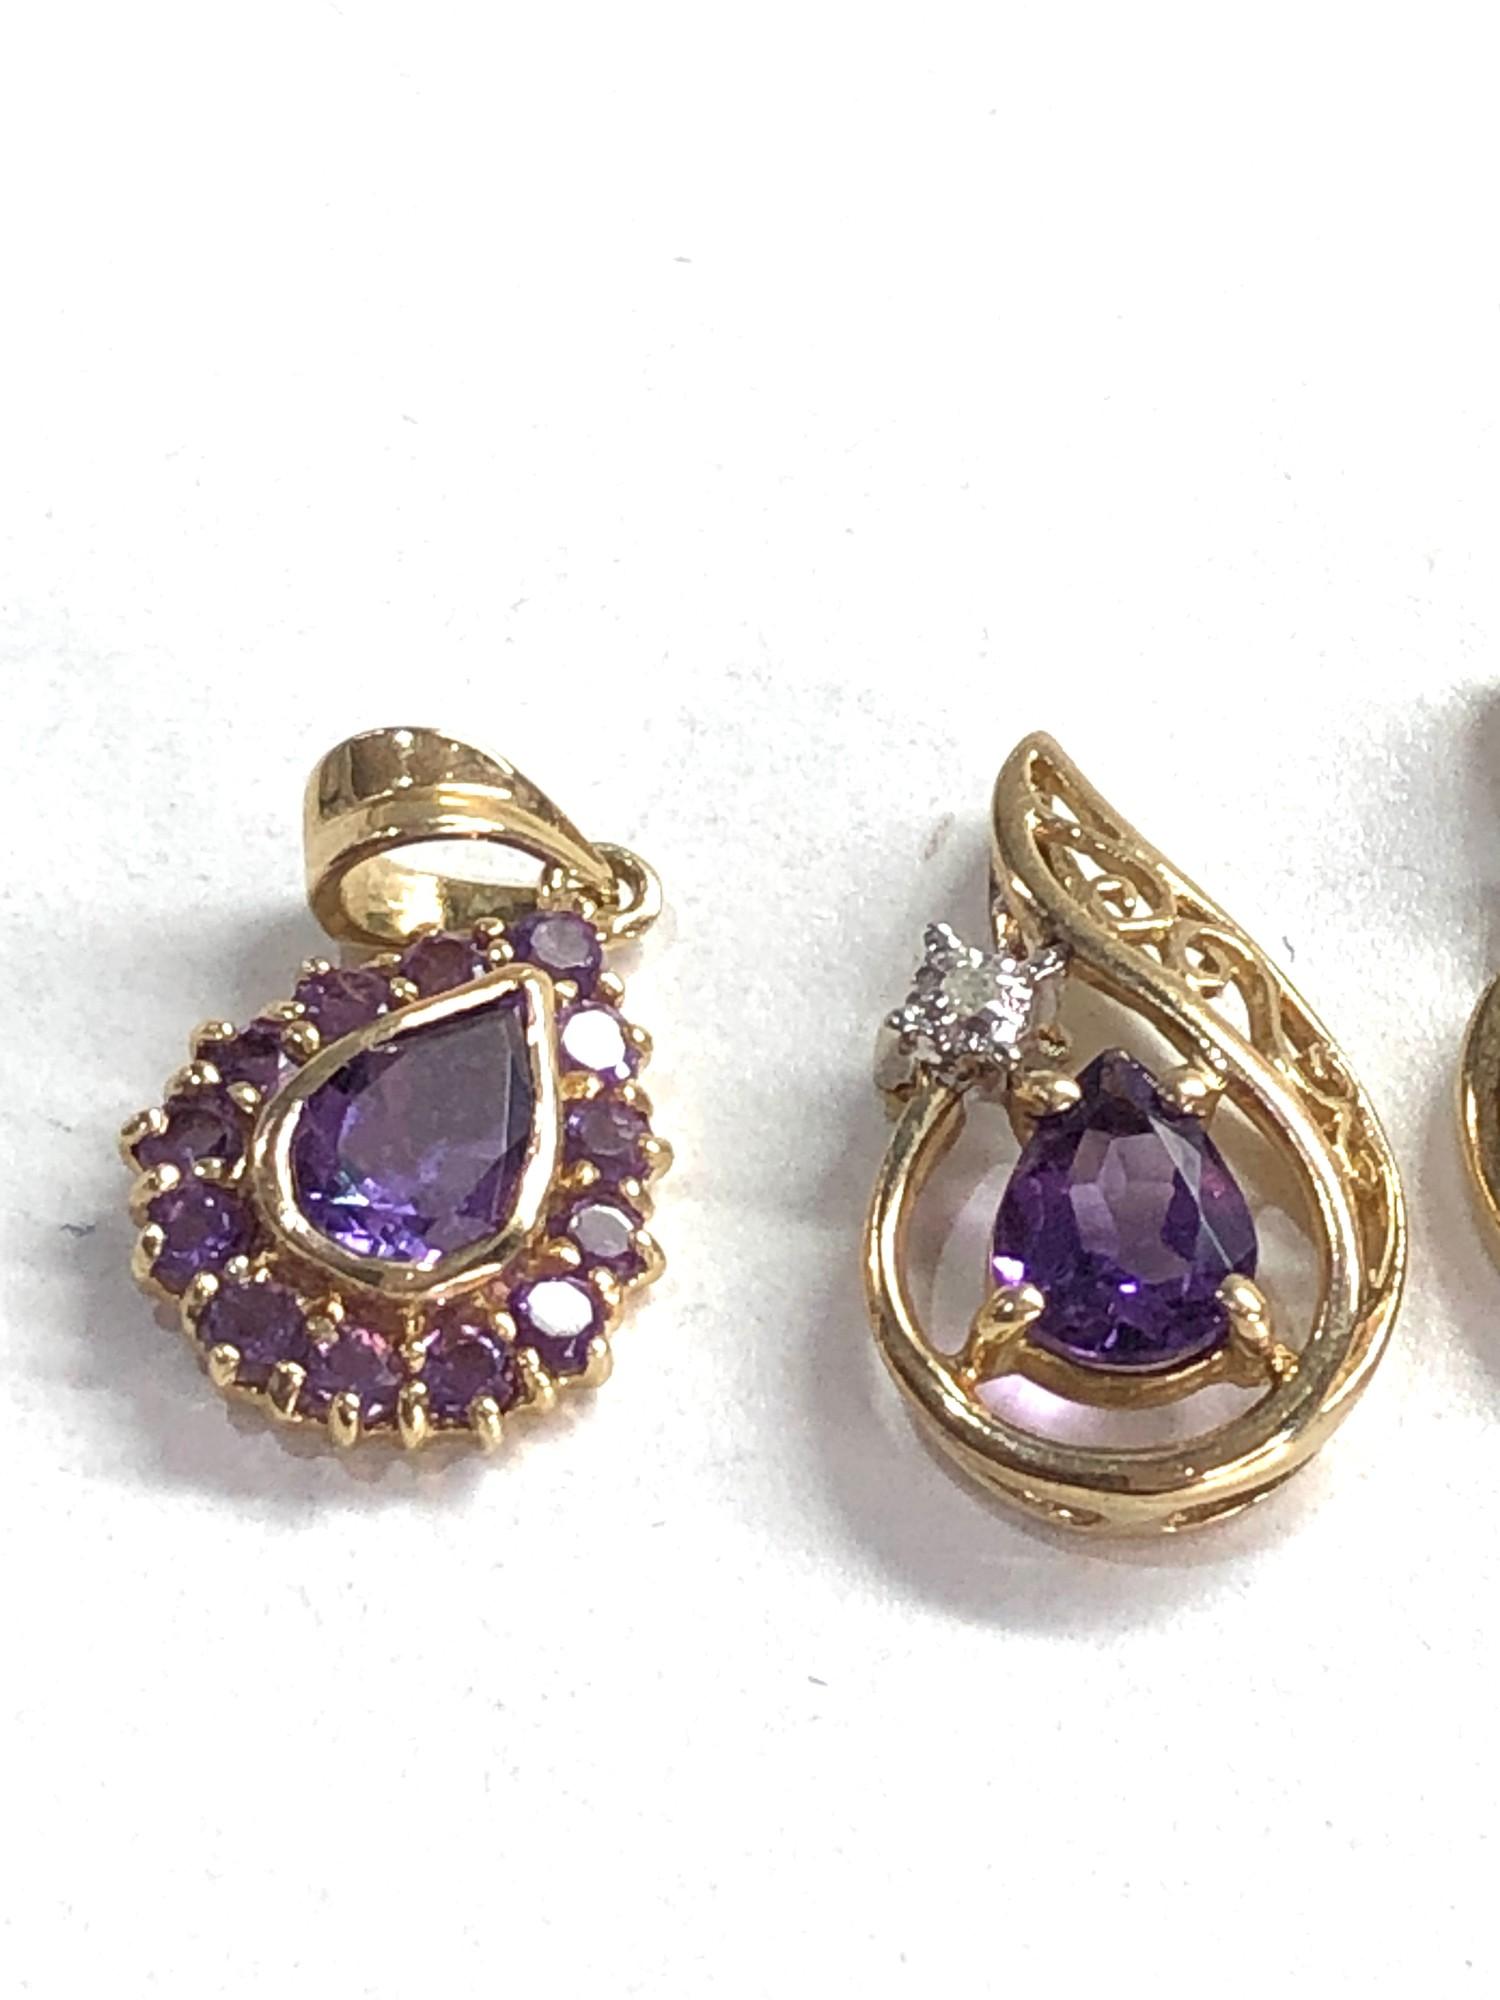 4 x 9ct gold gemstone pendants inc. peridot, amethyst - Image 2 of 3